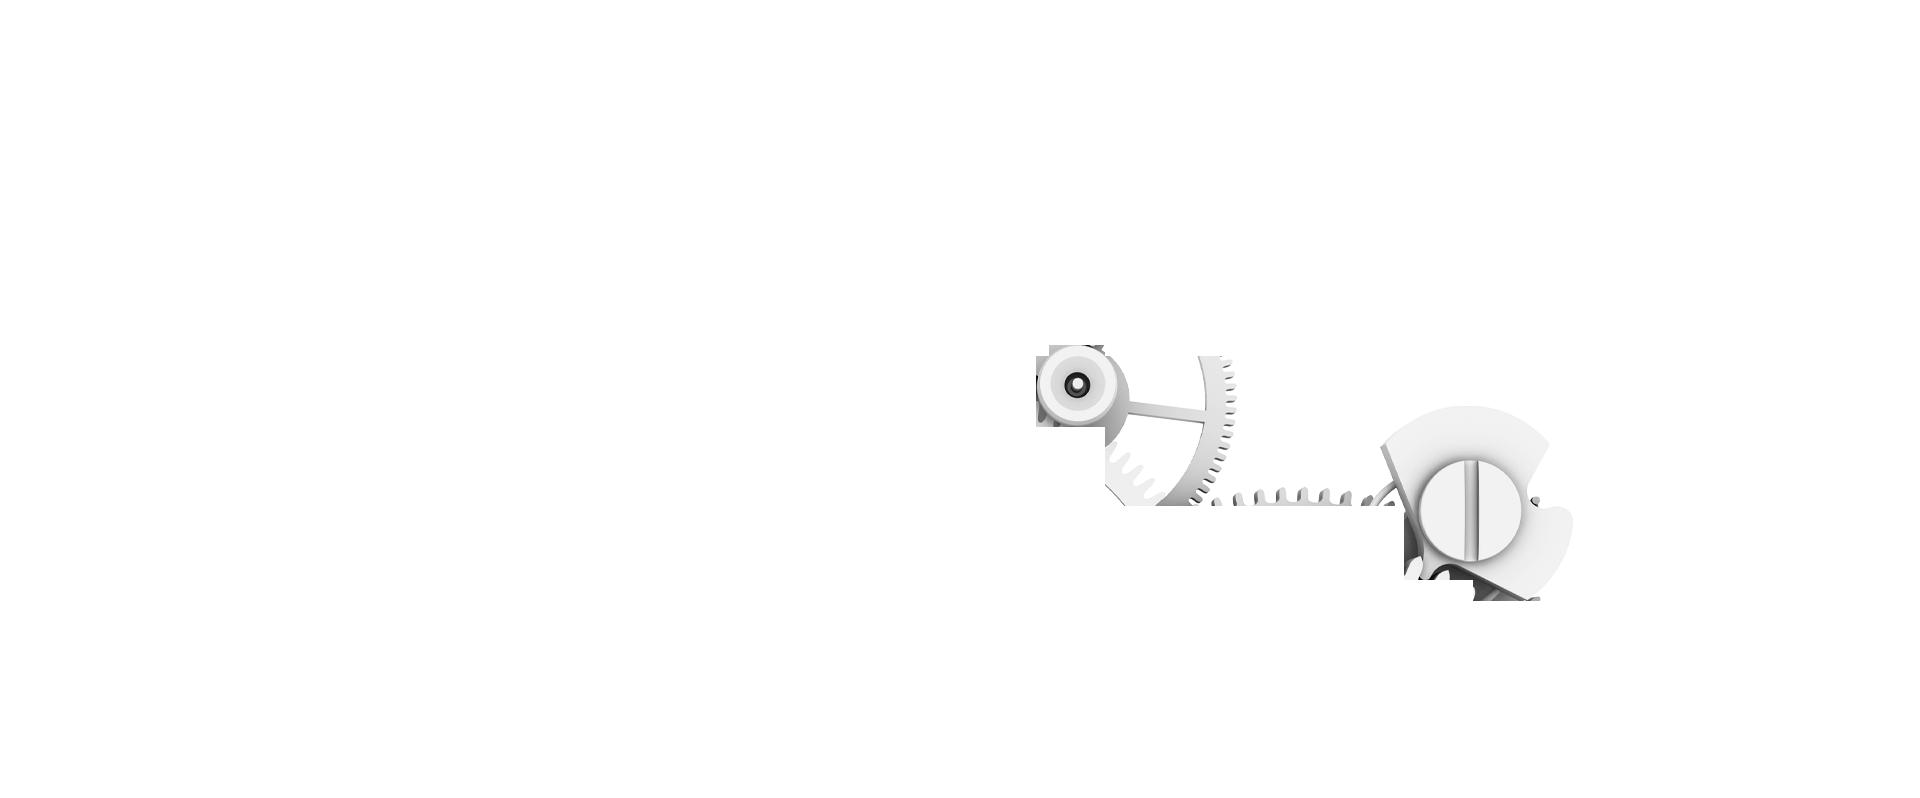 adcasum_wheel_part_